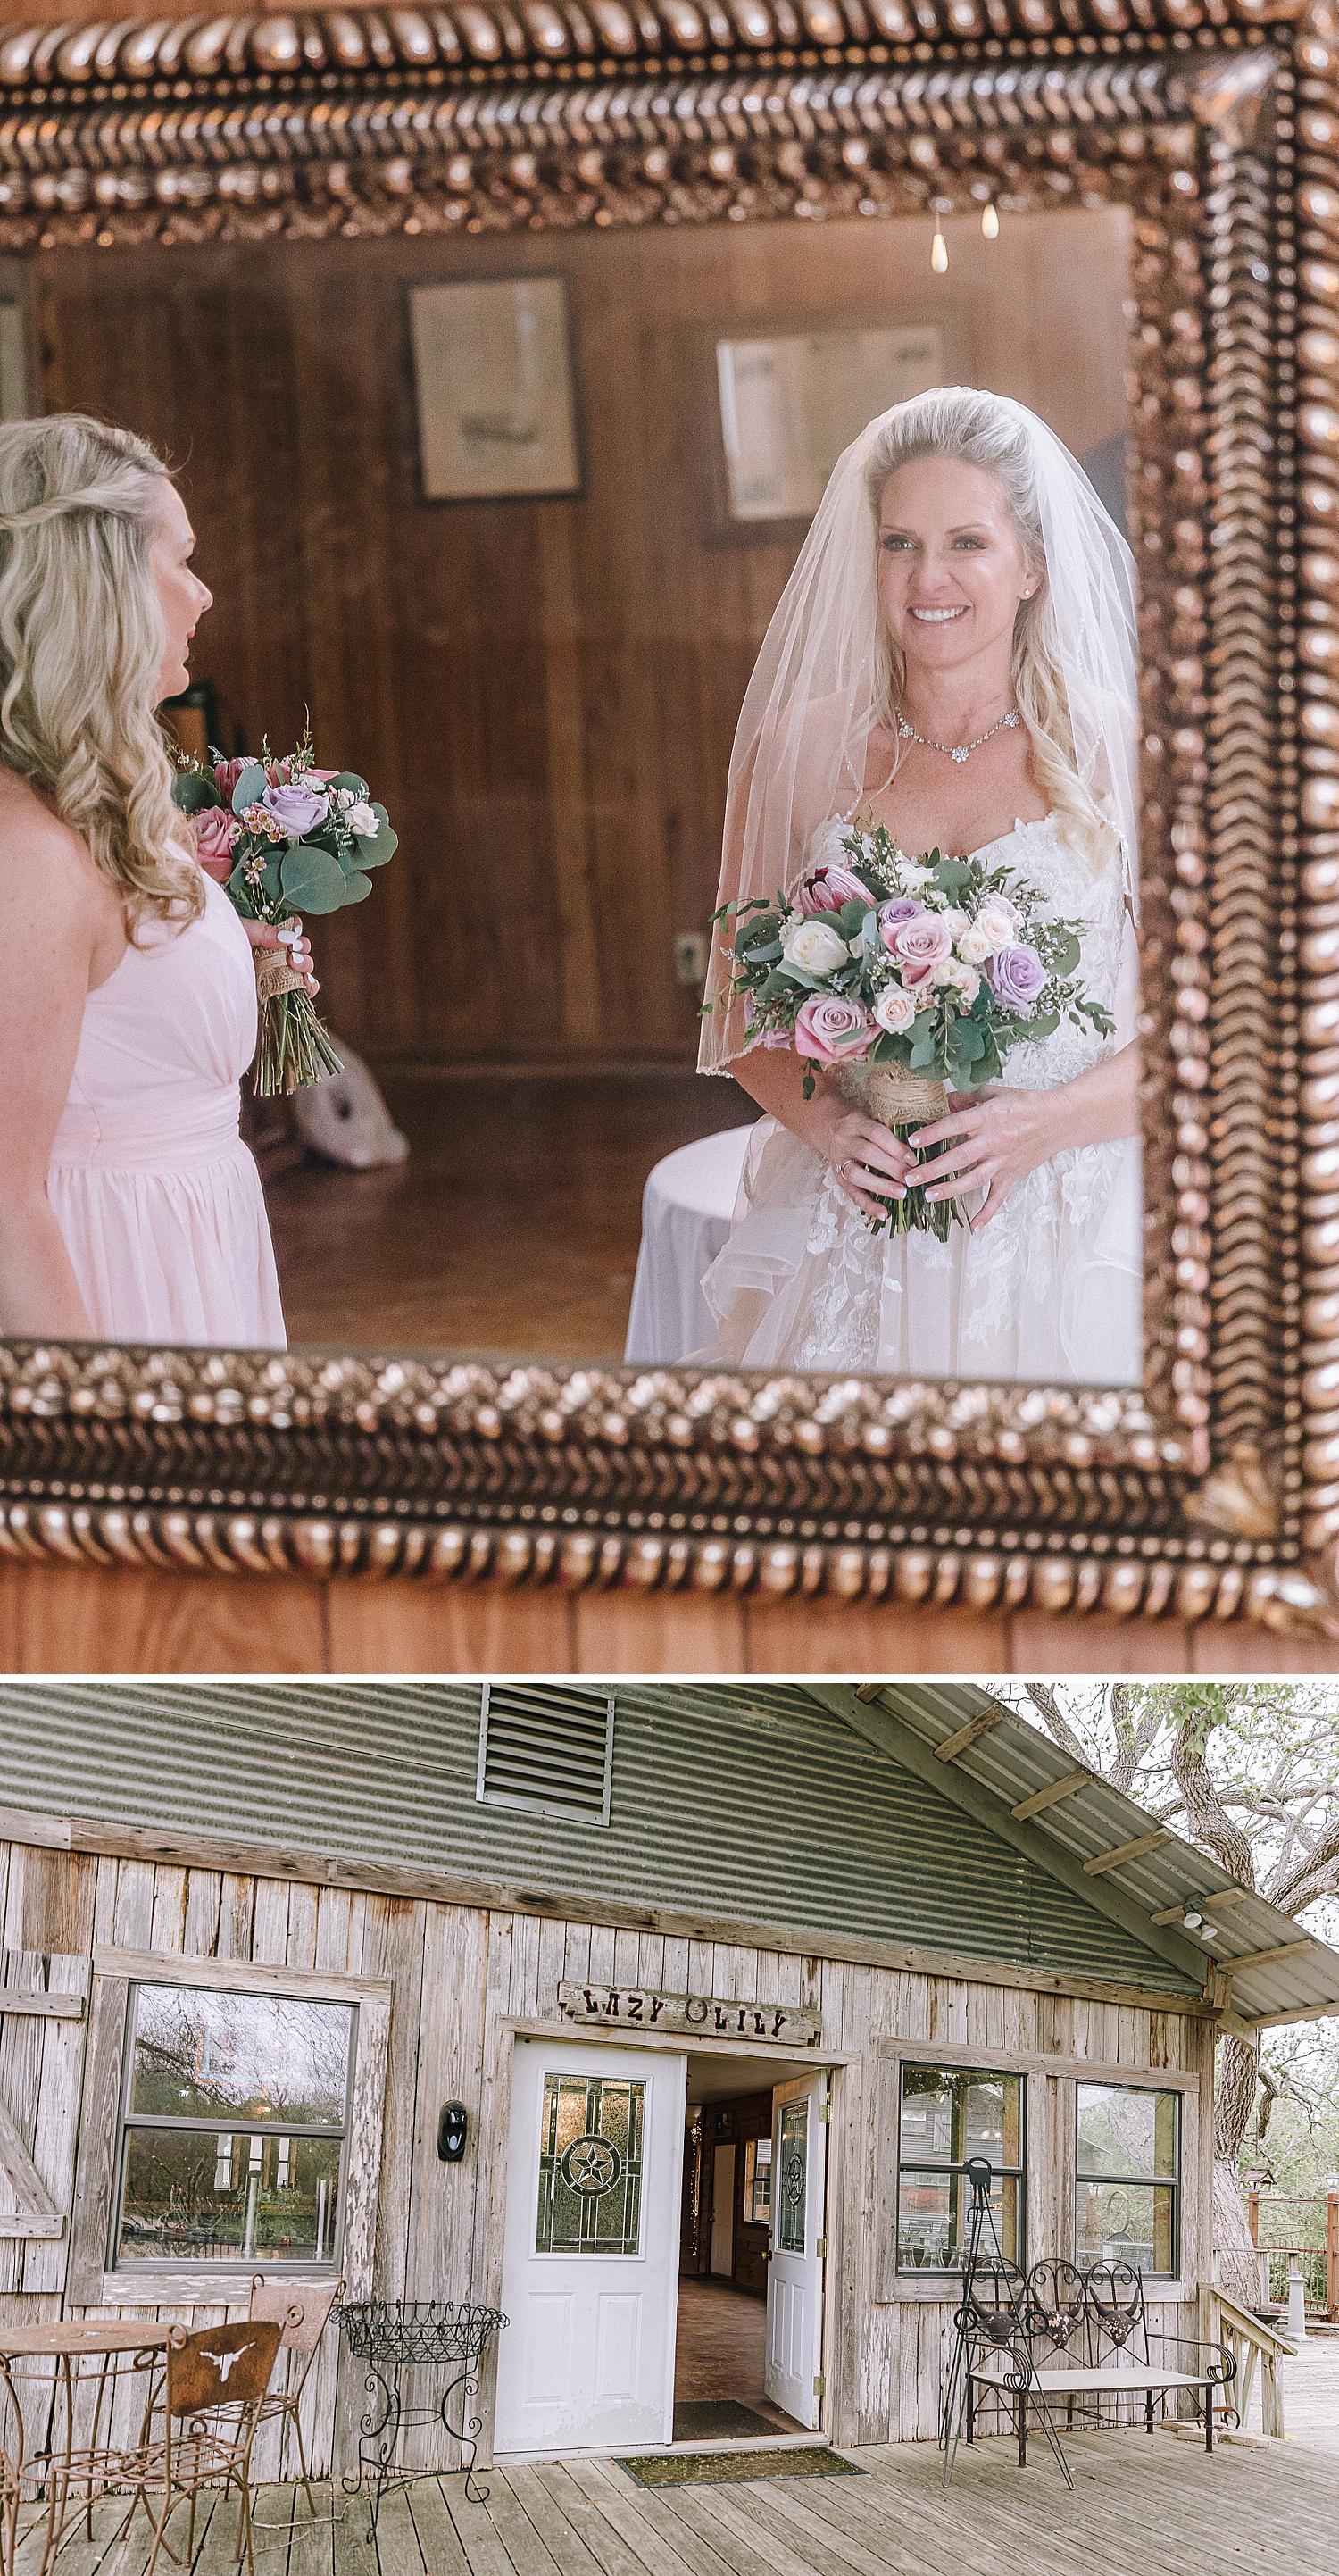 Rio-Cibilo-Ranch-Marion-Texas-Wedding-Rustic-Blush-Rose-Quartz-Details-Carly-Barton-Photography_0024.jpg